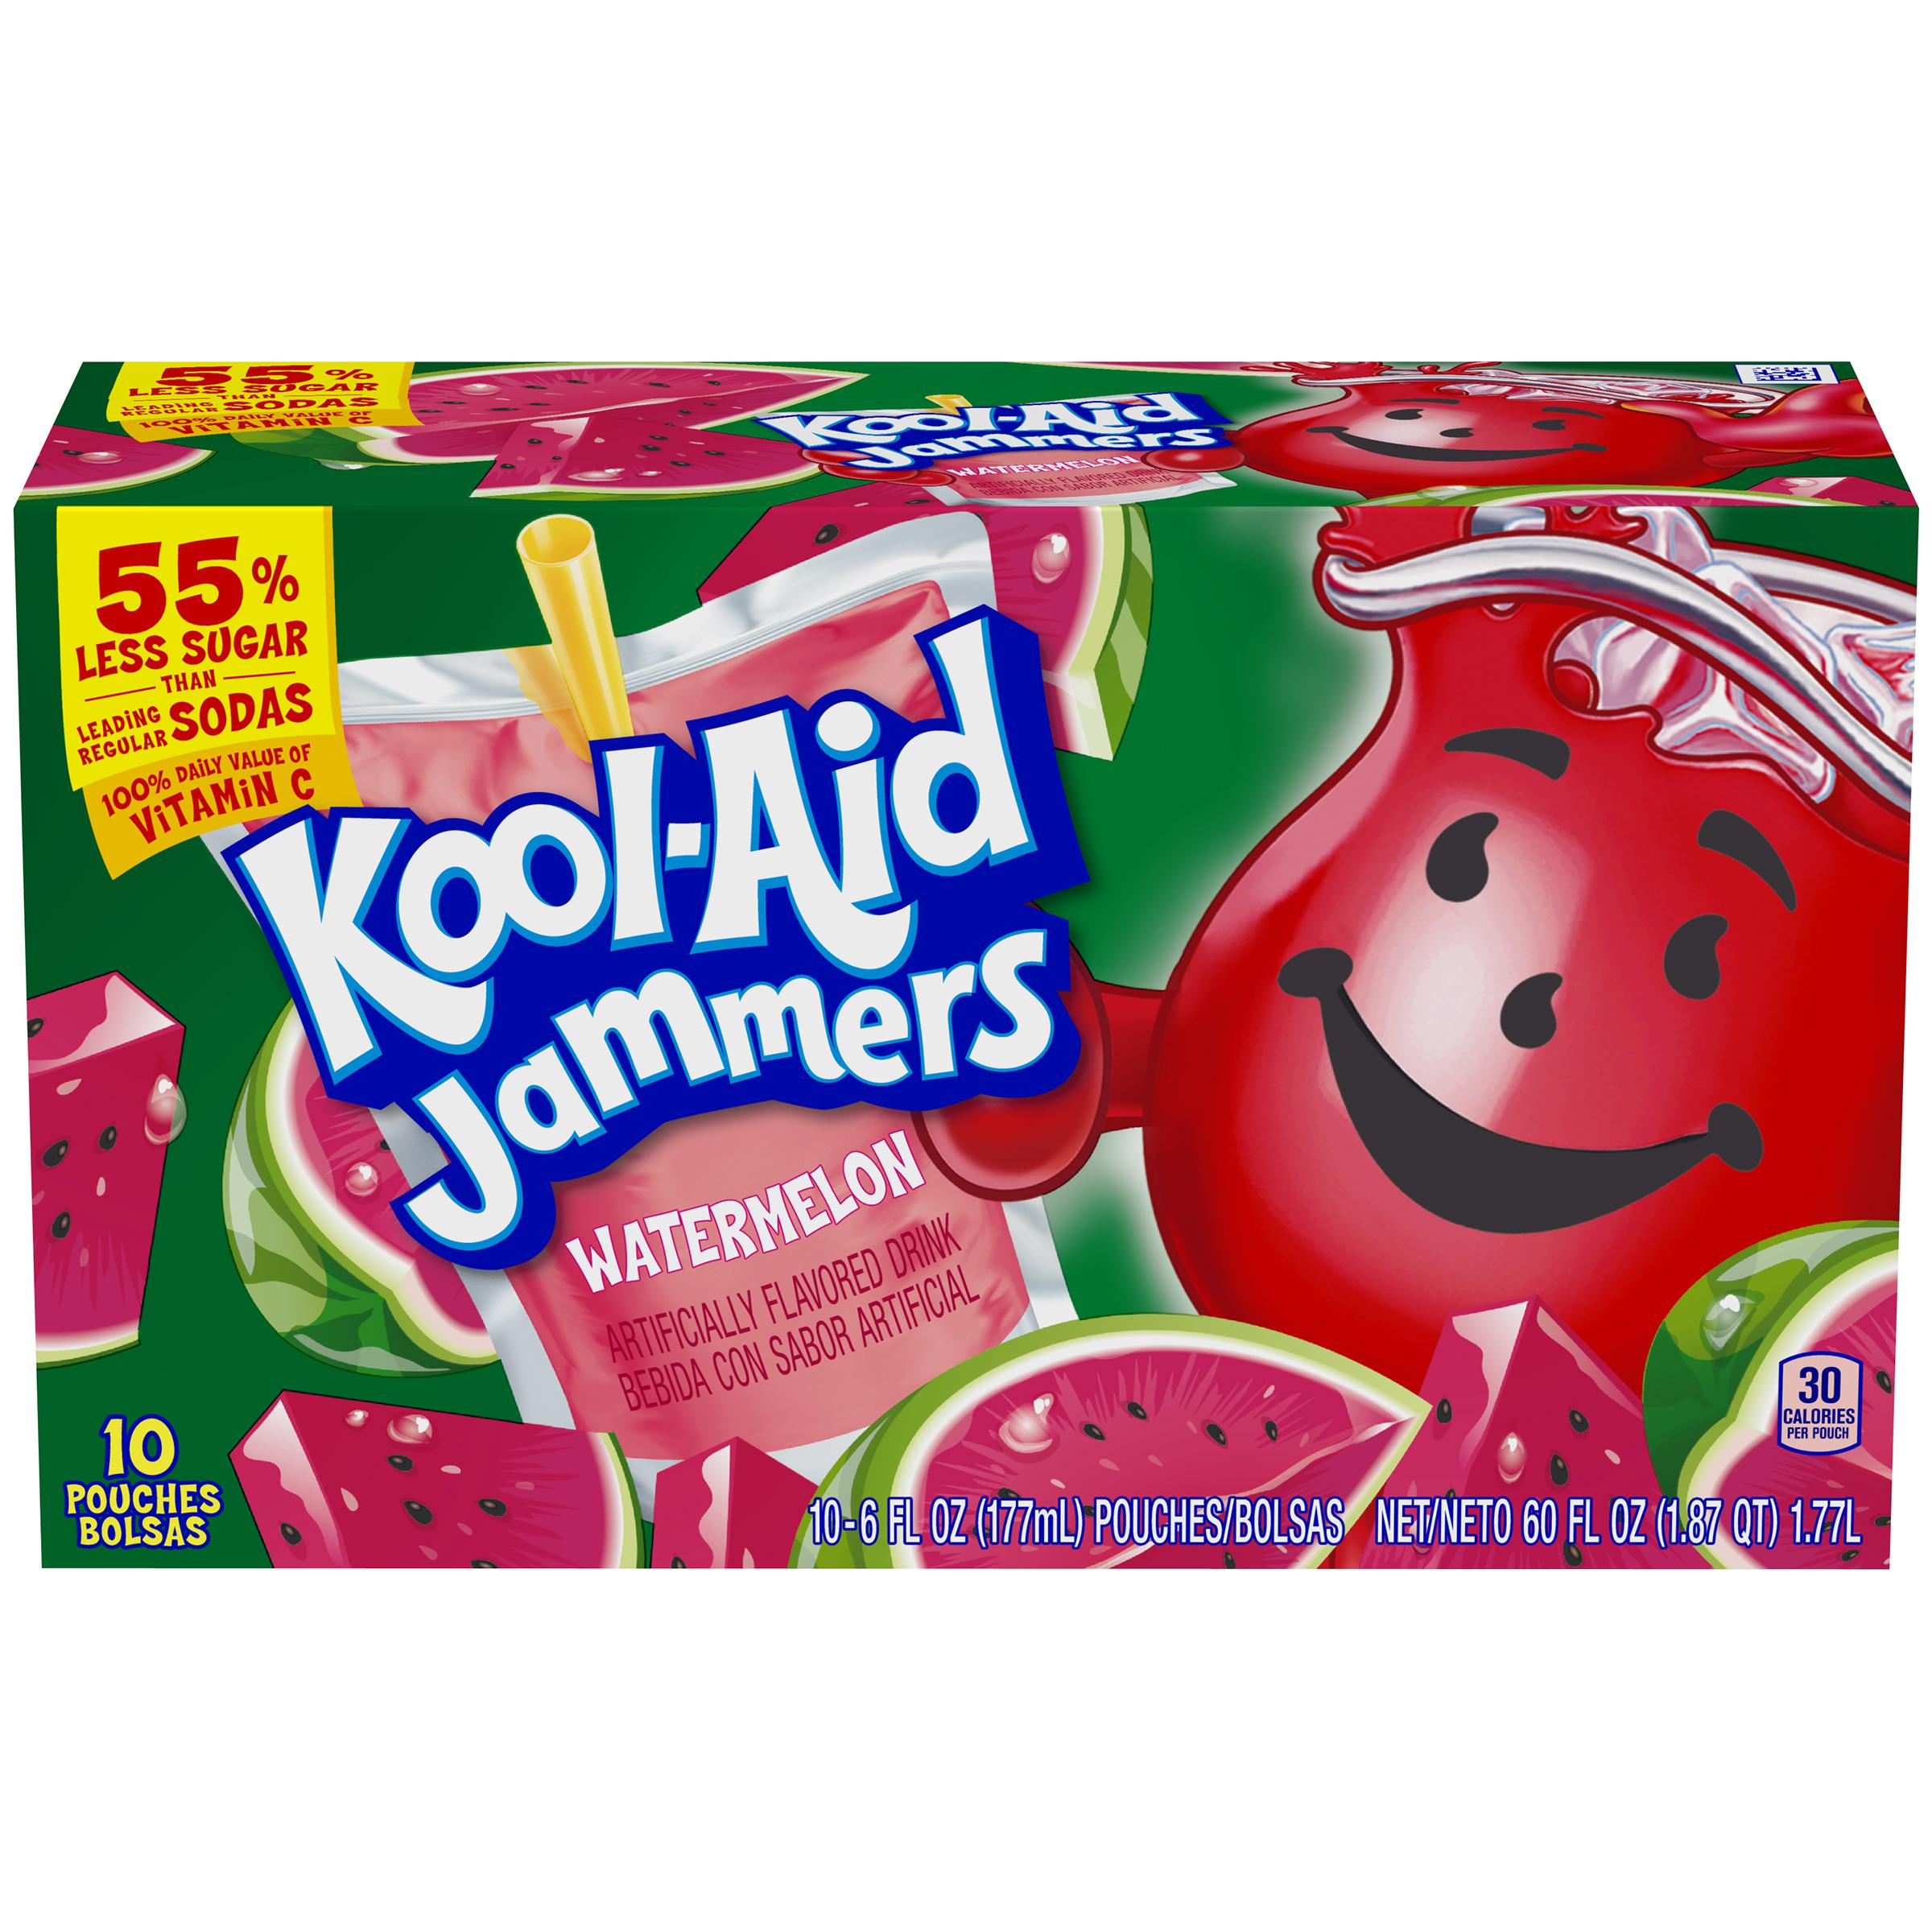 Kool-Aid Jammers Watermelon Flavored Drink 60 fl oz Box (10-6 fl oz Pouches) image